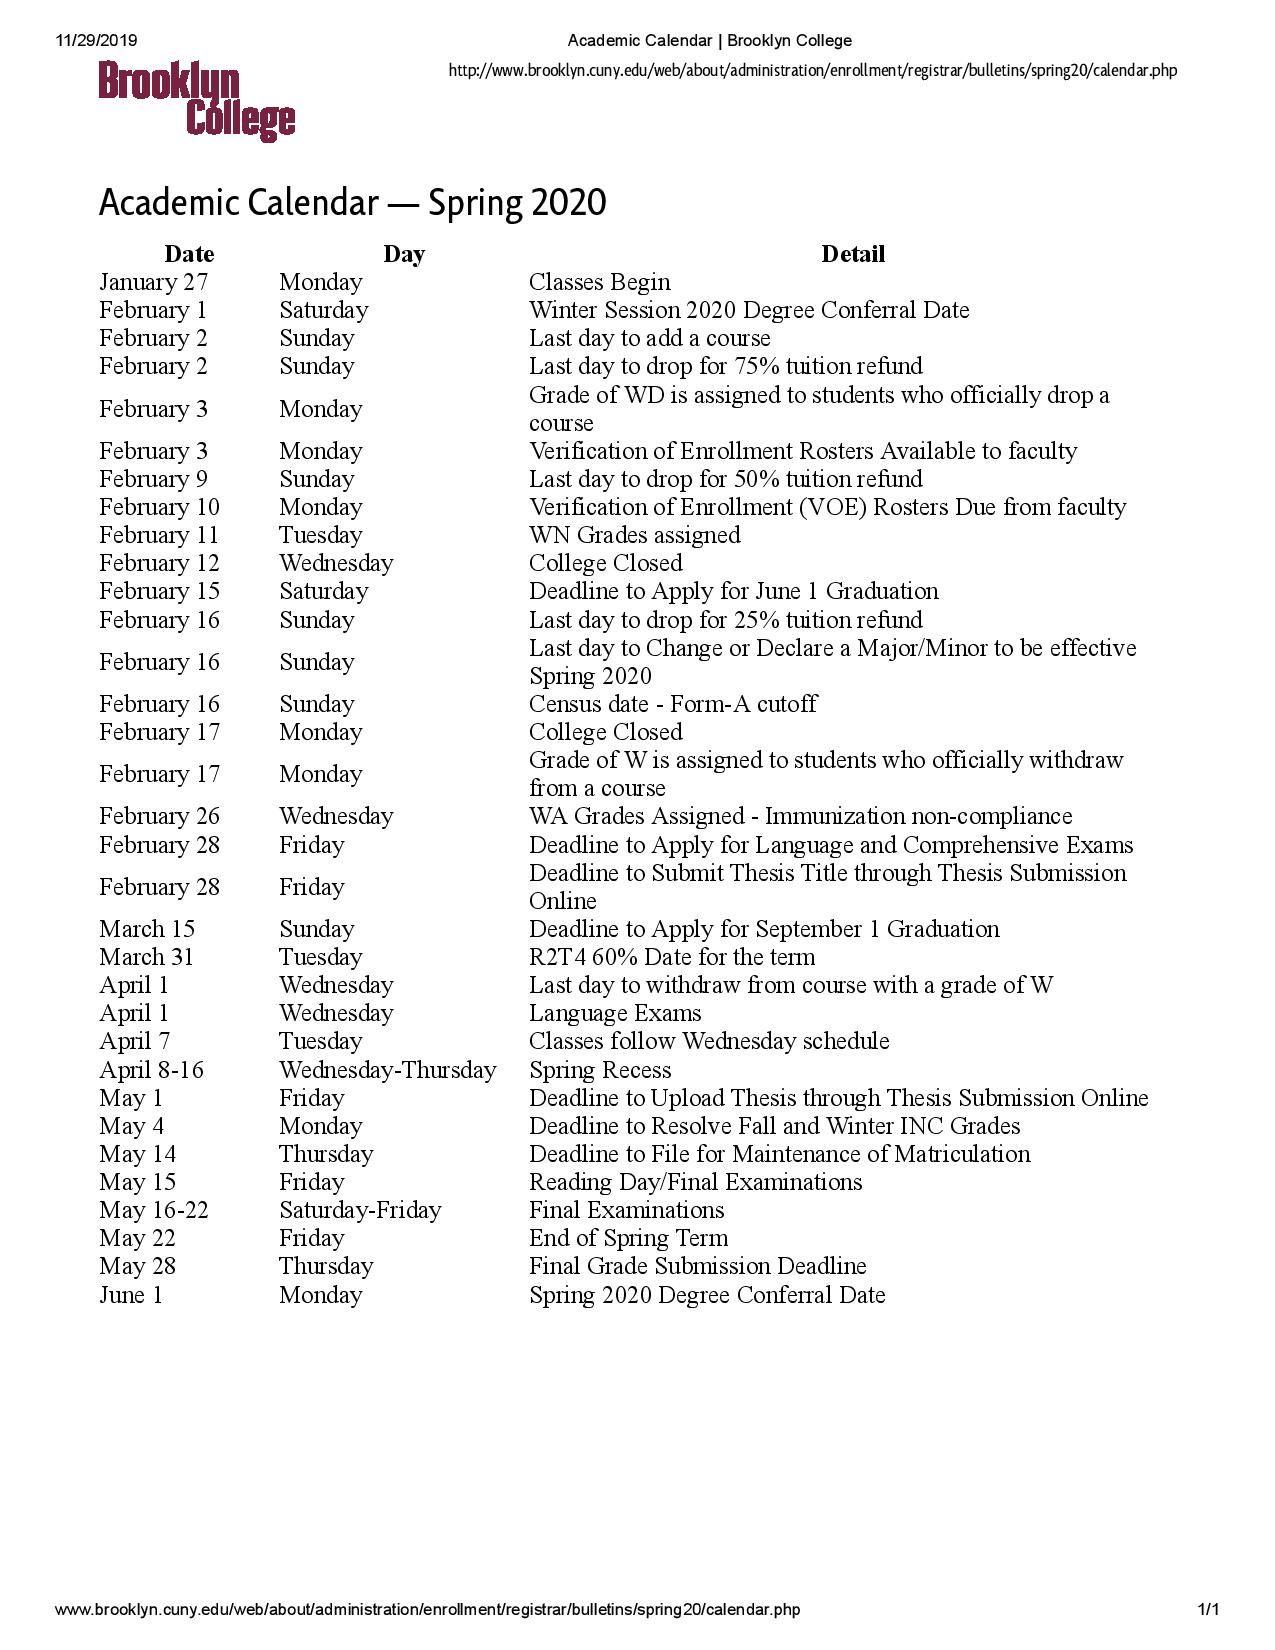 Cuny 2022 Spring Calendar.Brooklyn College Calendar With Holidays Printable Https Www Youcalendars Com Brooklyn College Calendar Html Academic Calendar Calendar College